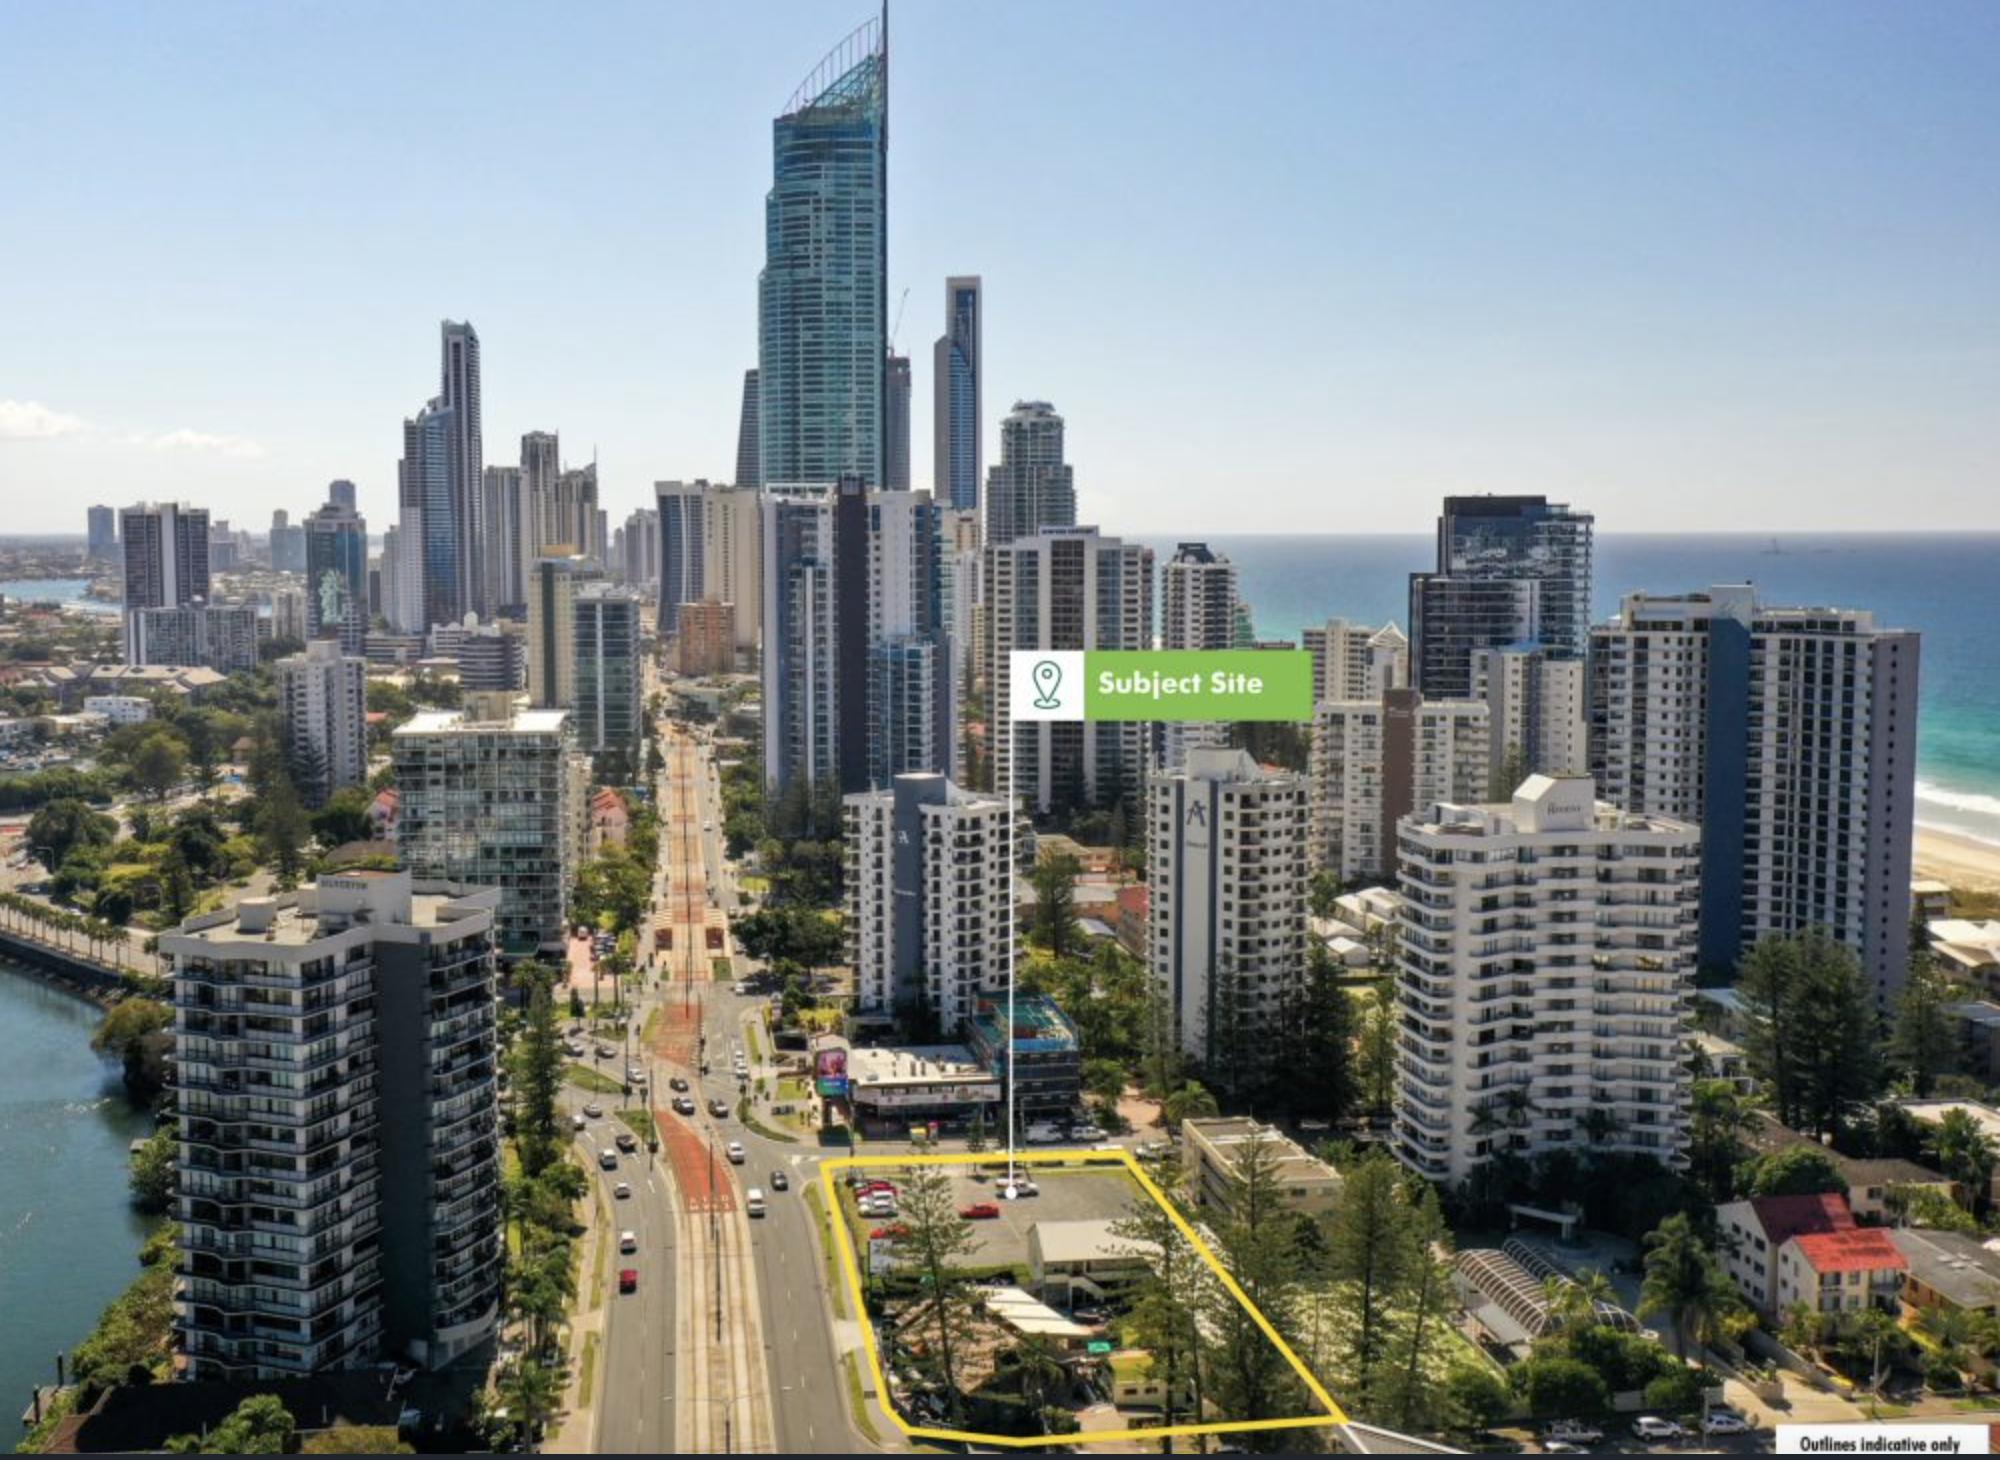 Established Gold Coast Beach Side Development Site & Hotel Offered For Sale